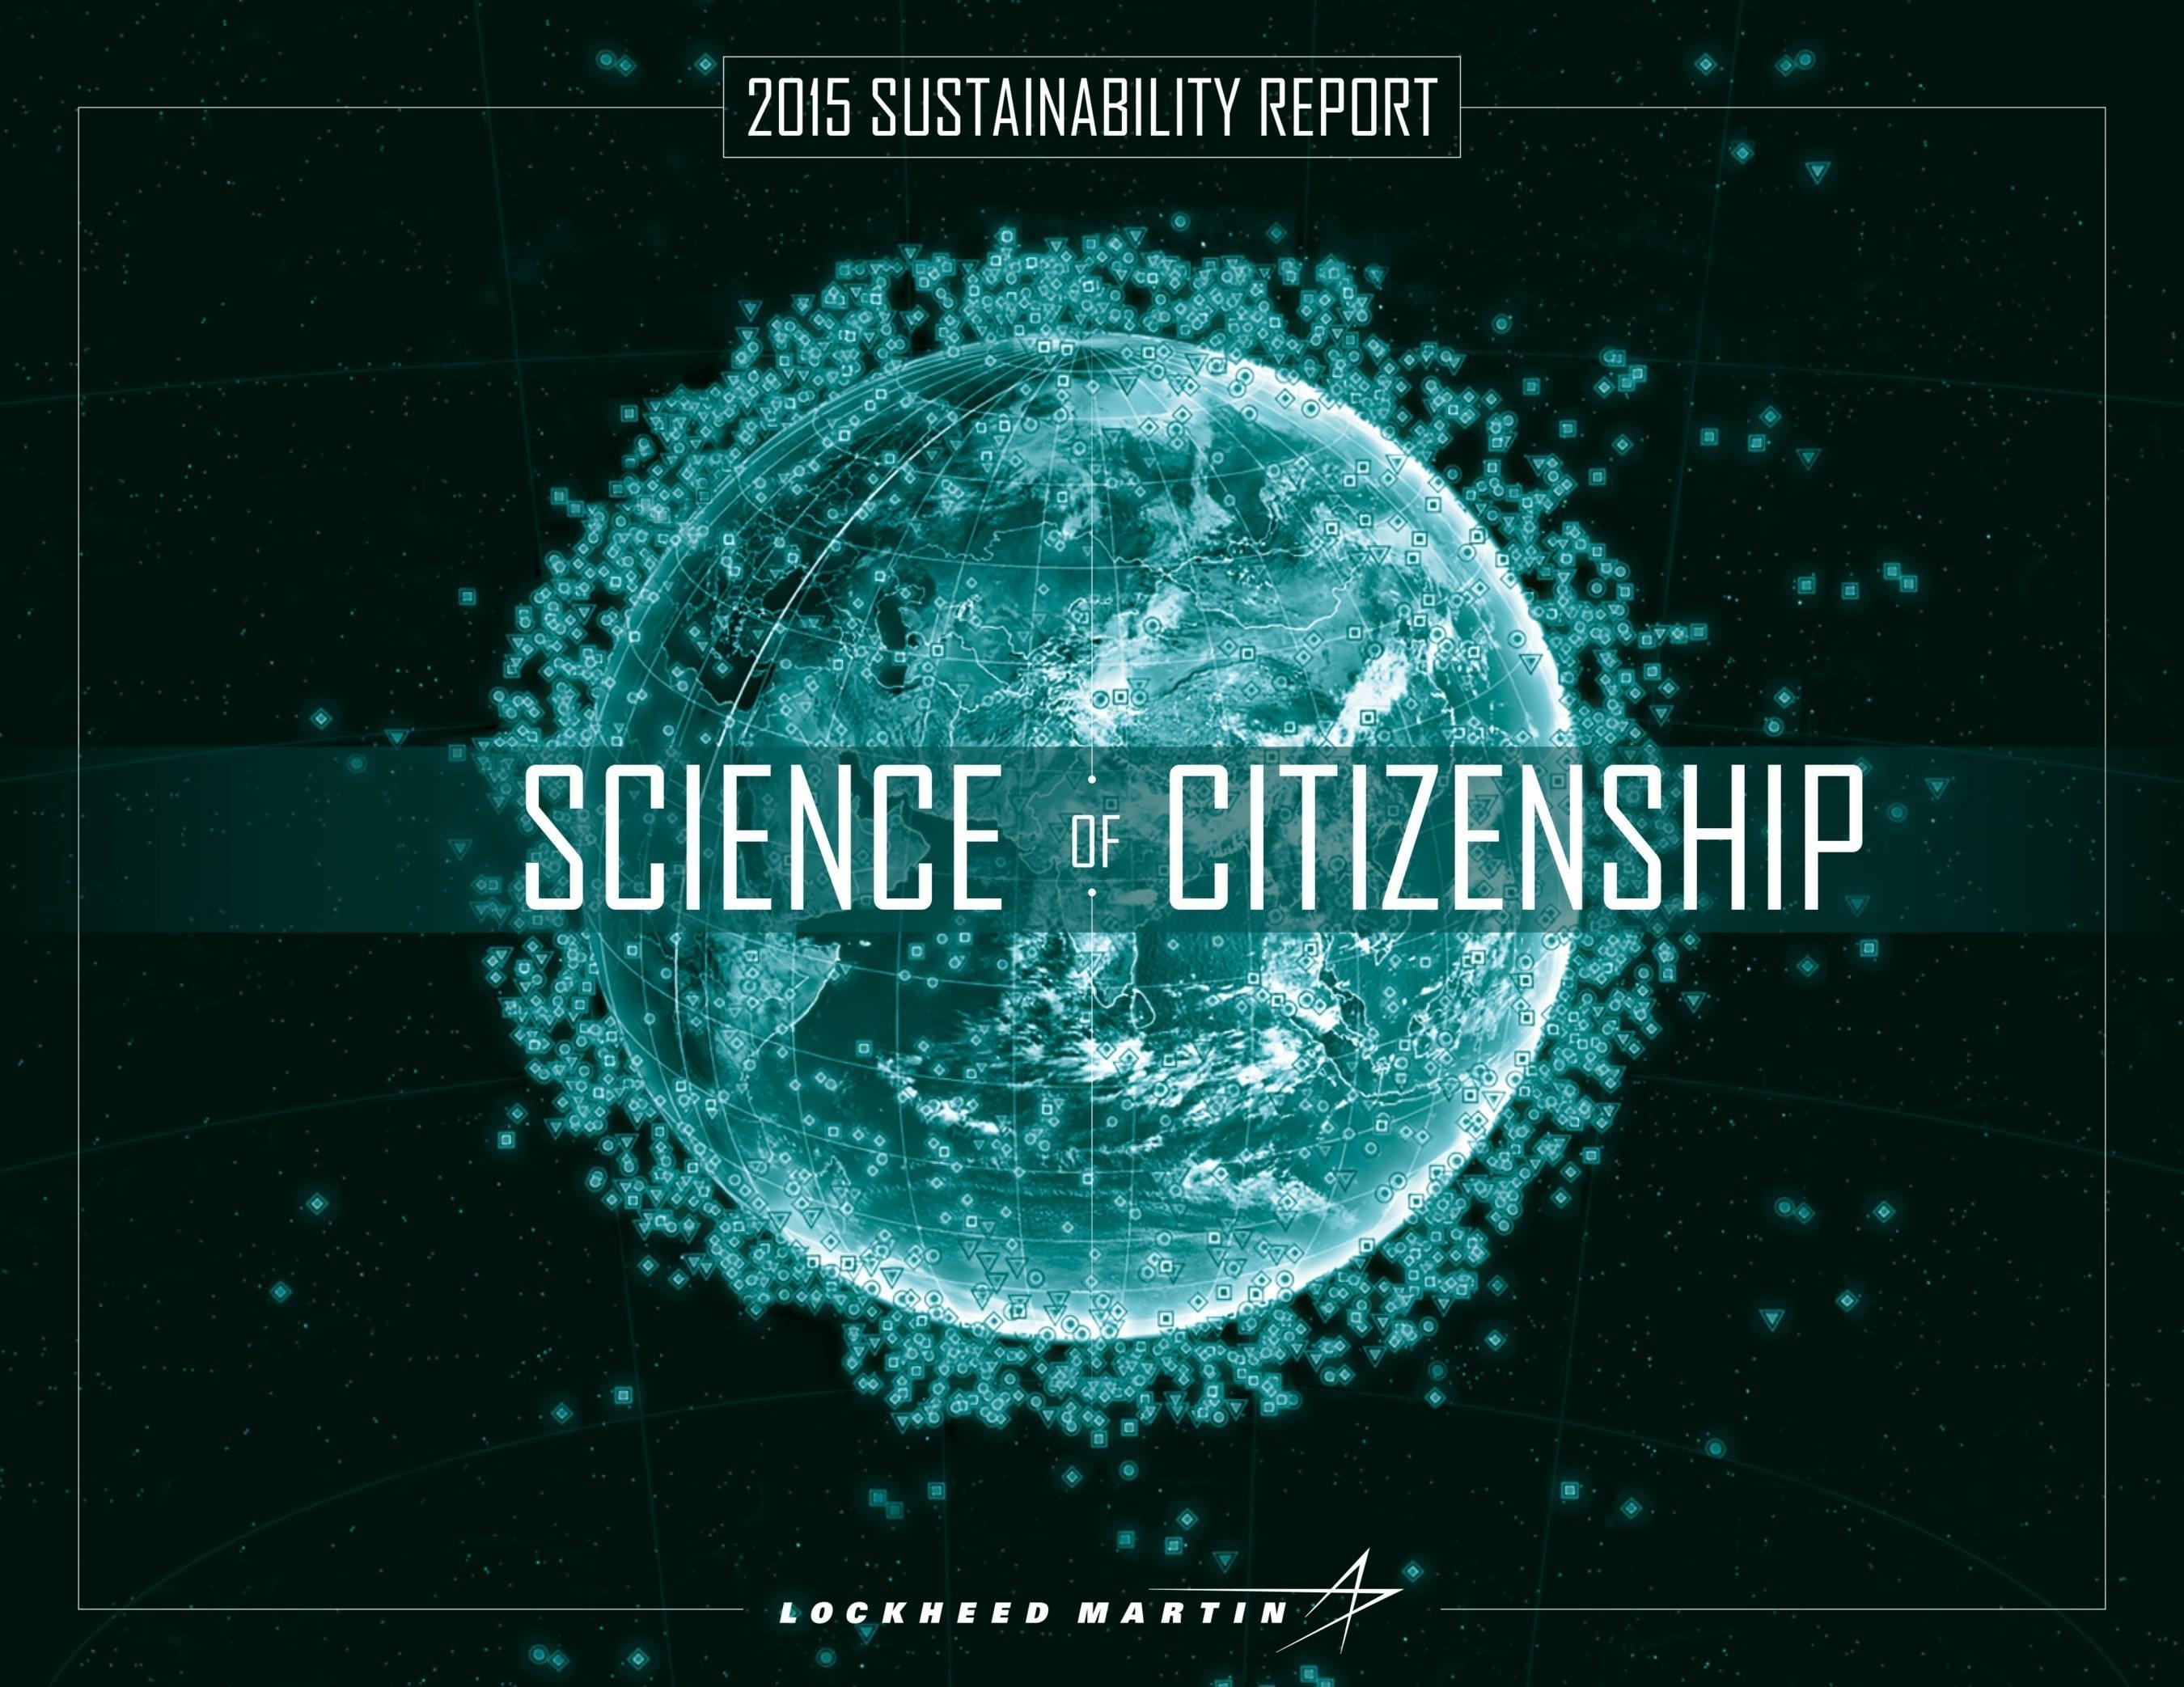 Lockheed Martin 2015 Sustainability Report 'Science of Citizenship'